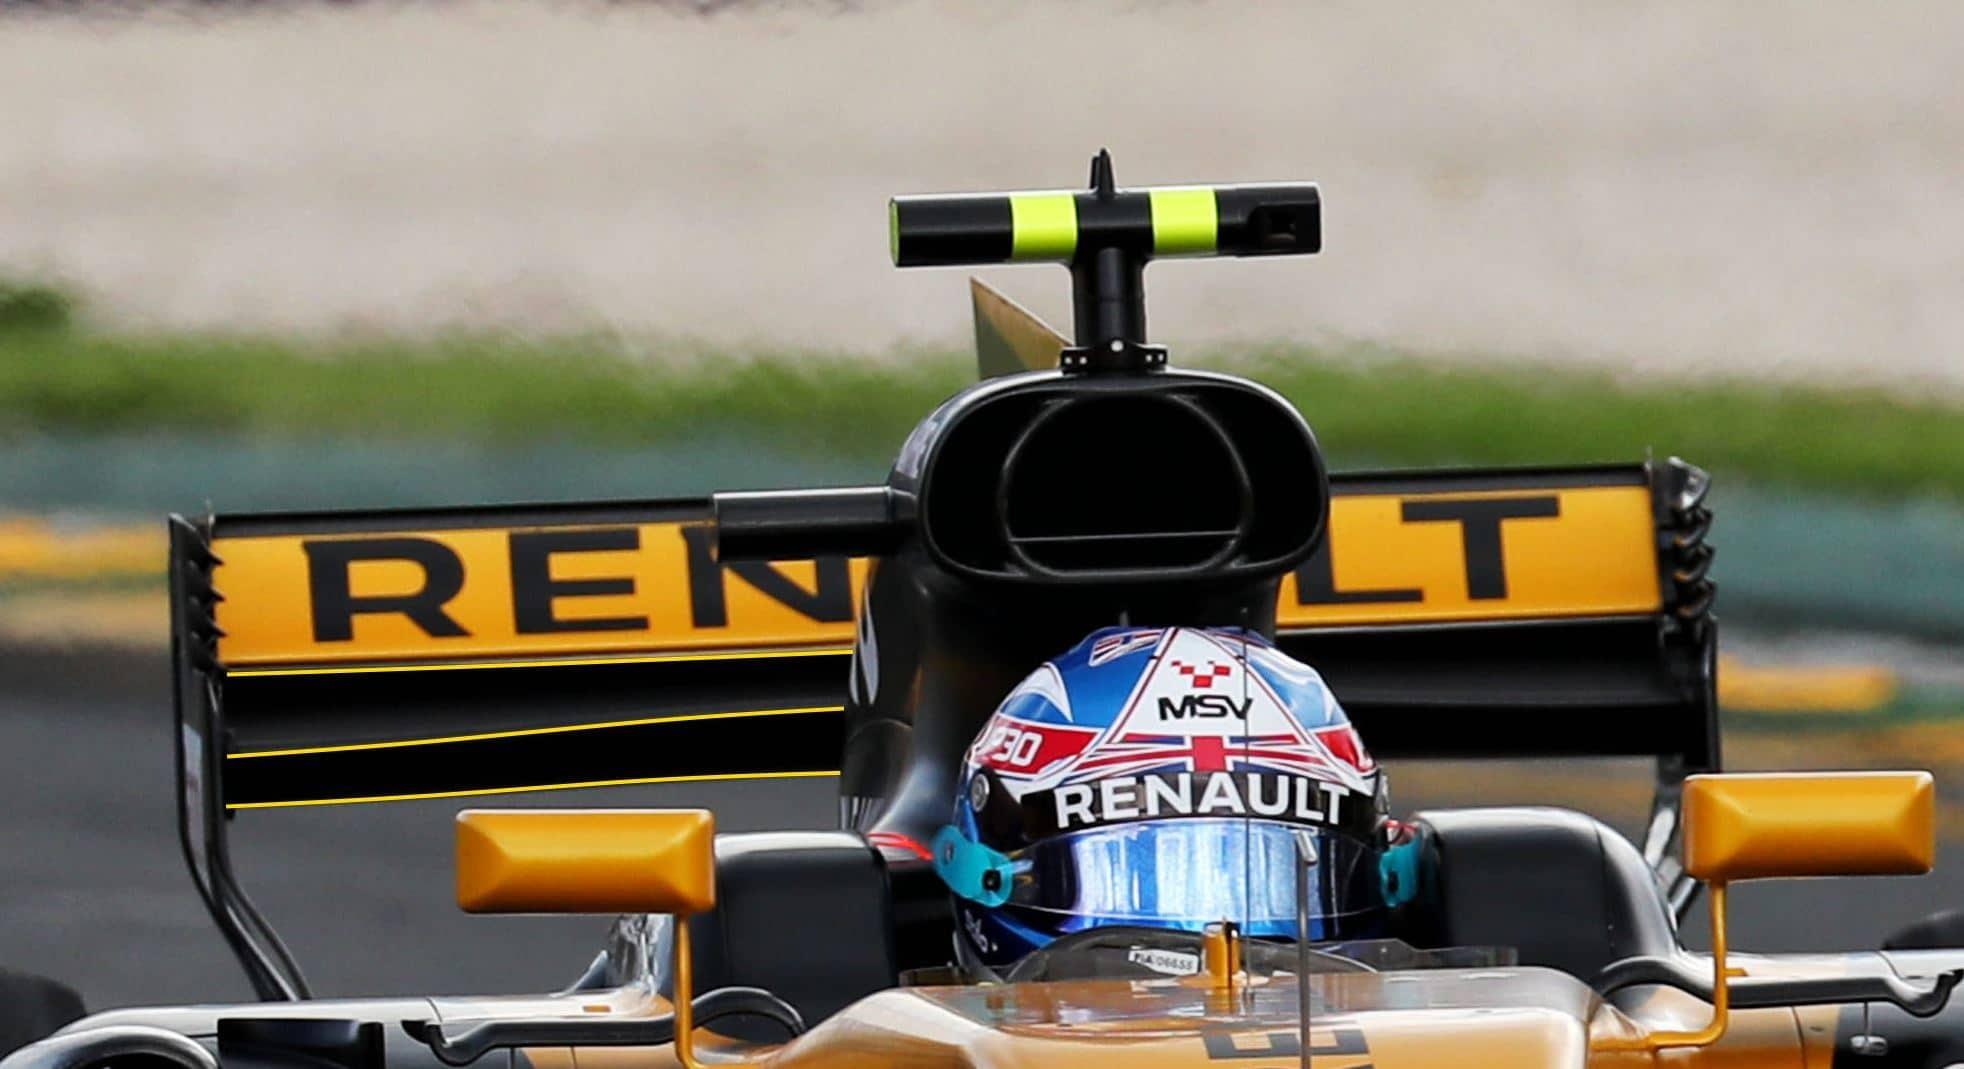 Renault RS17 rear wing Australia F1 2017 Foto Renault MAXF1net